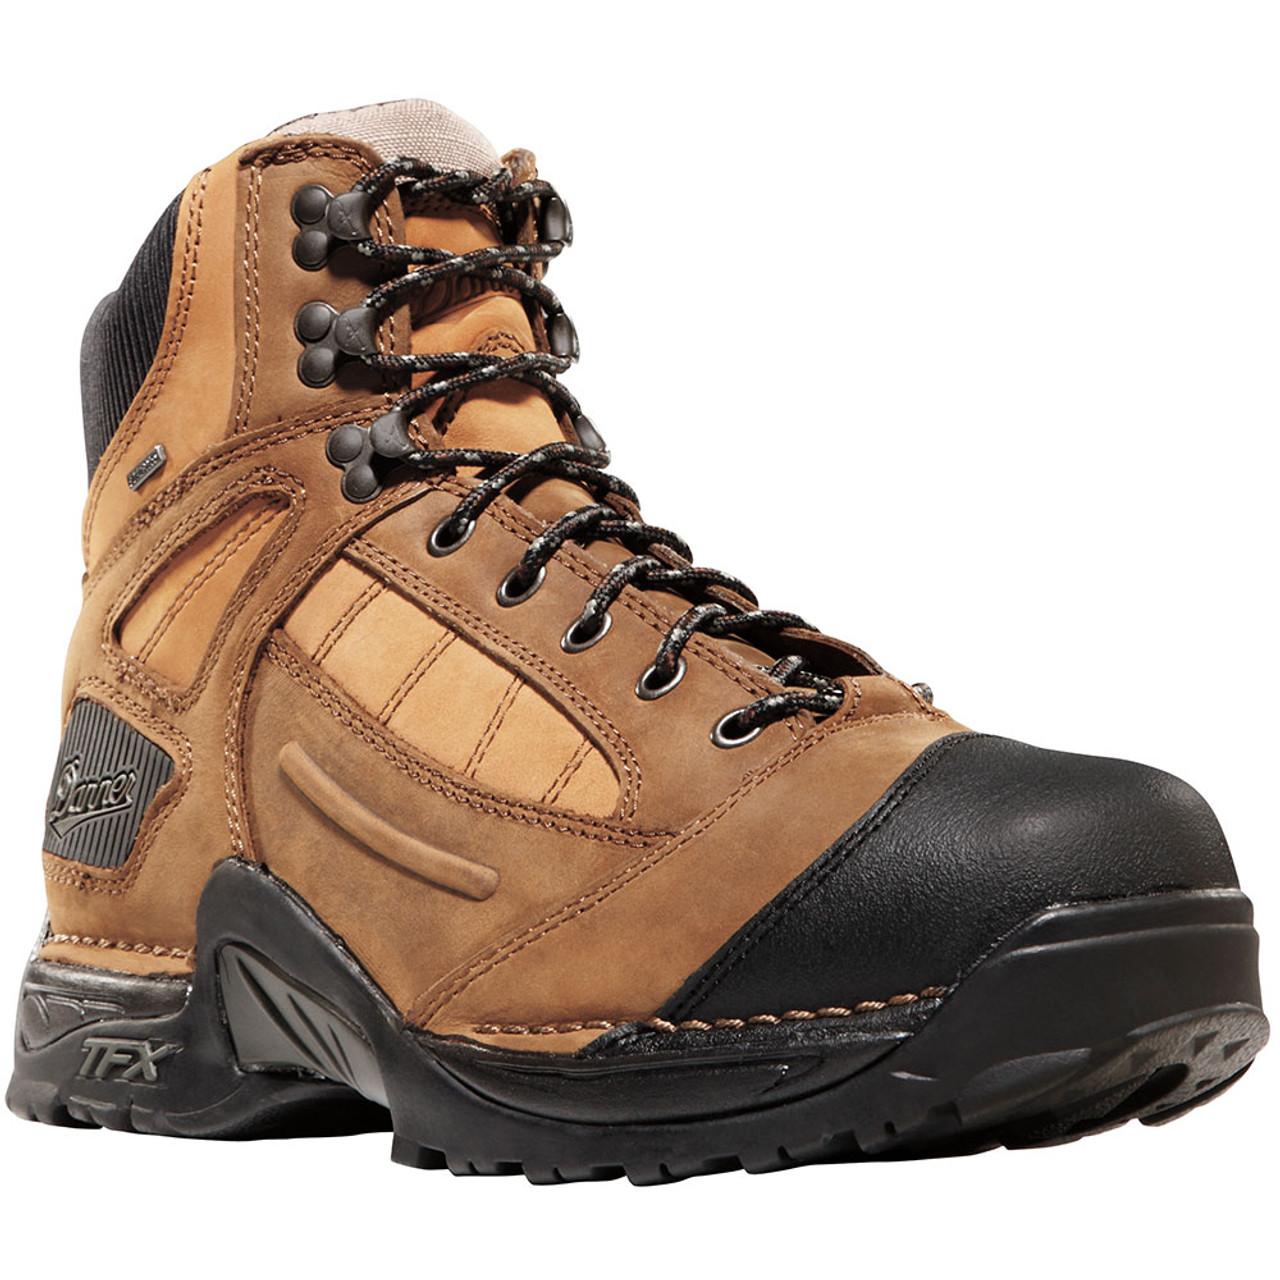 8c17a7b8110 Danner Instigator GTX Hiking Boots